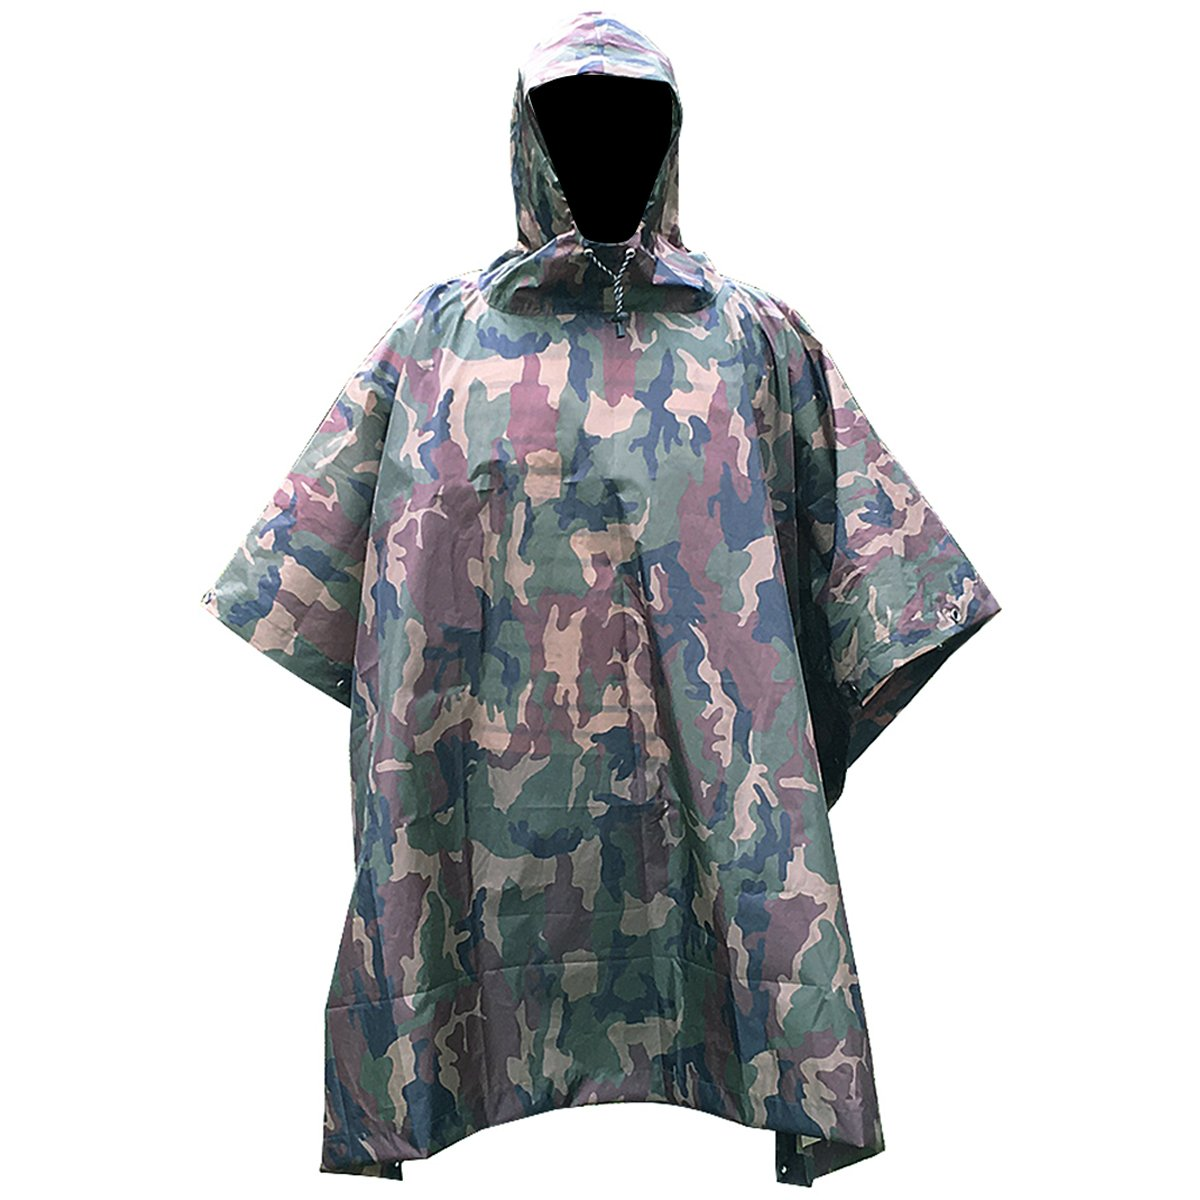 XTACER Multi-Use Rain Poncho 83''x55''/XL 3-IN-1 Raincoat